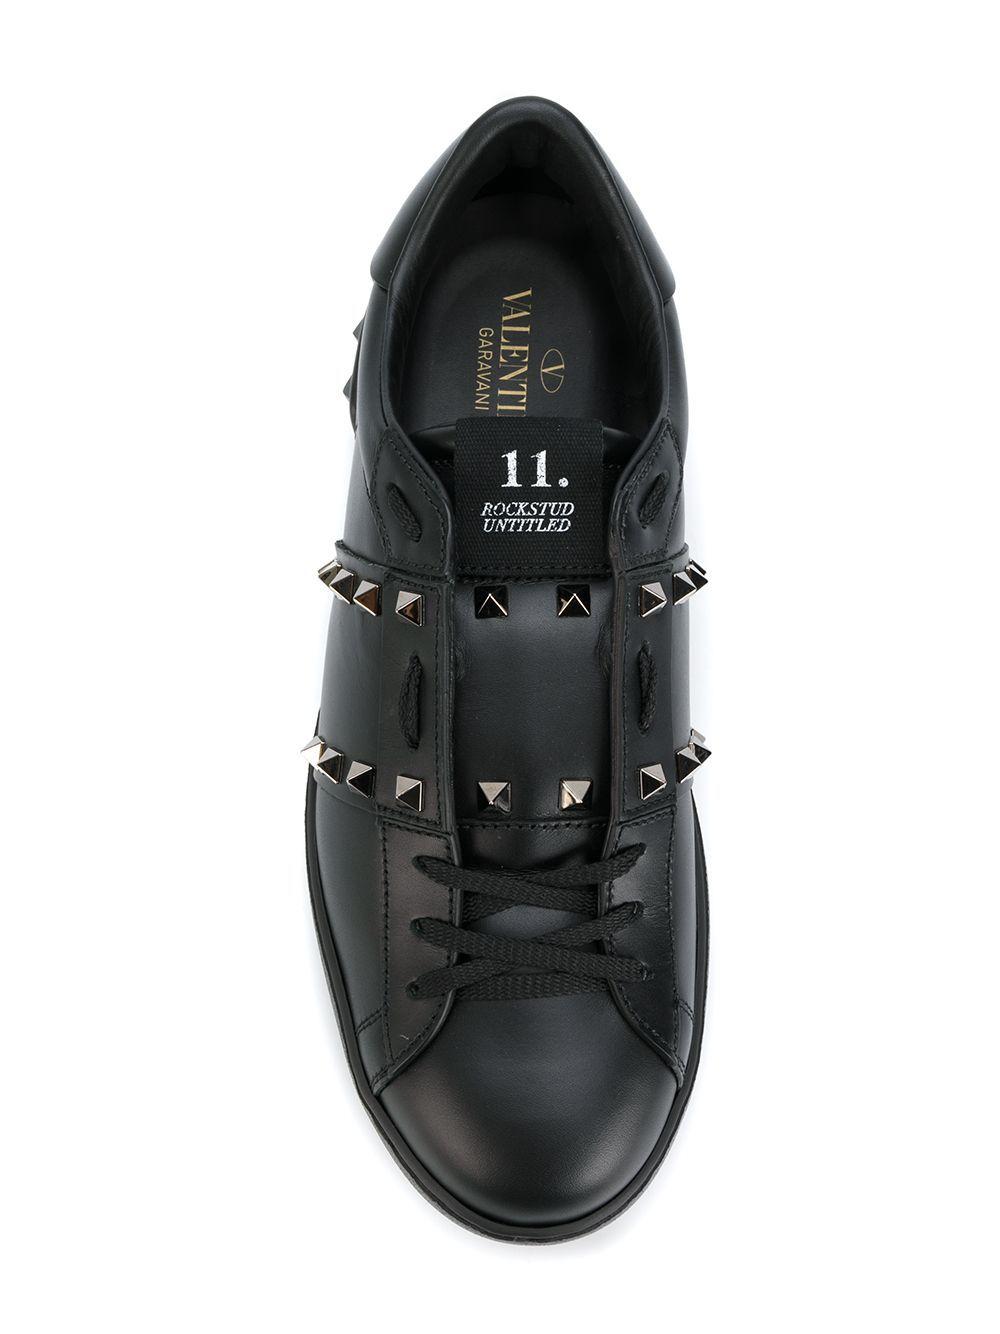 Sneaker rockstud untitled in pelle - Valentino Garavani